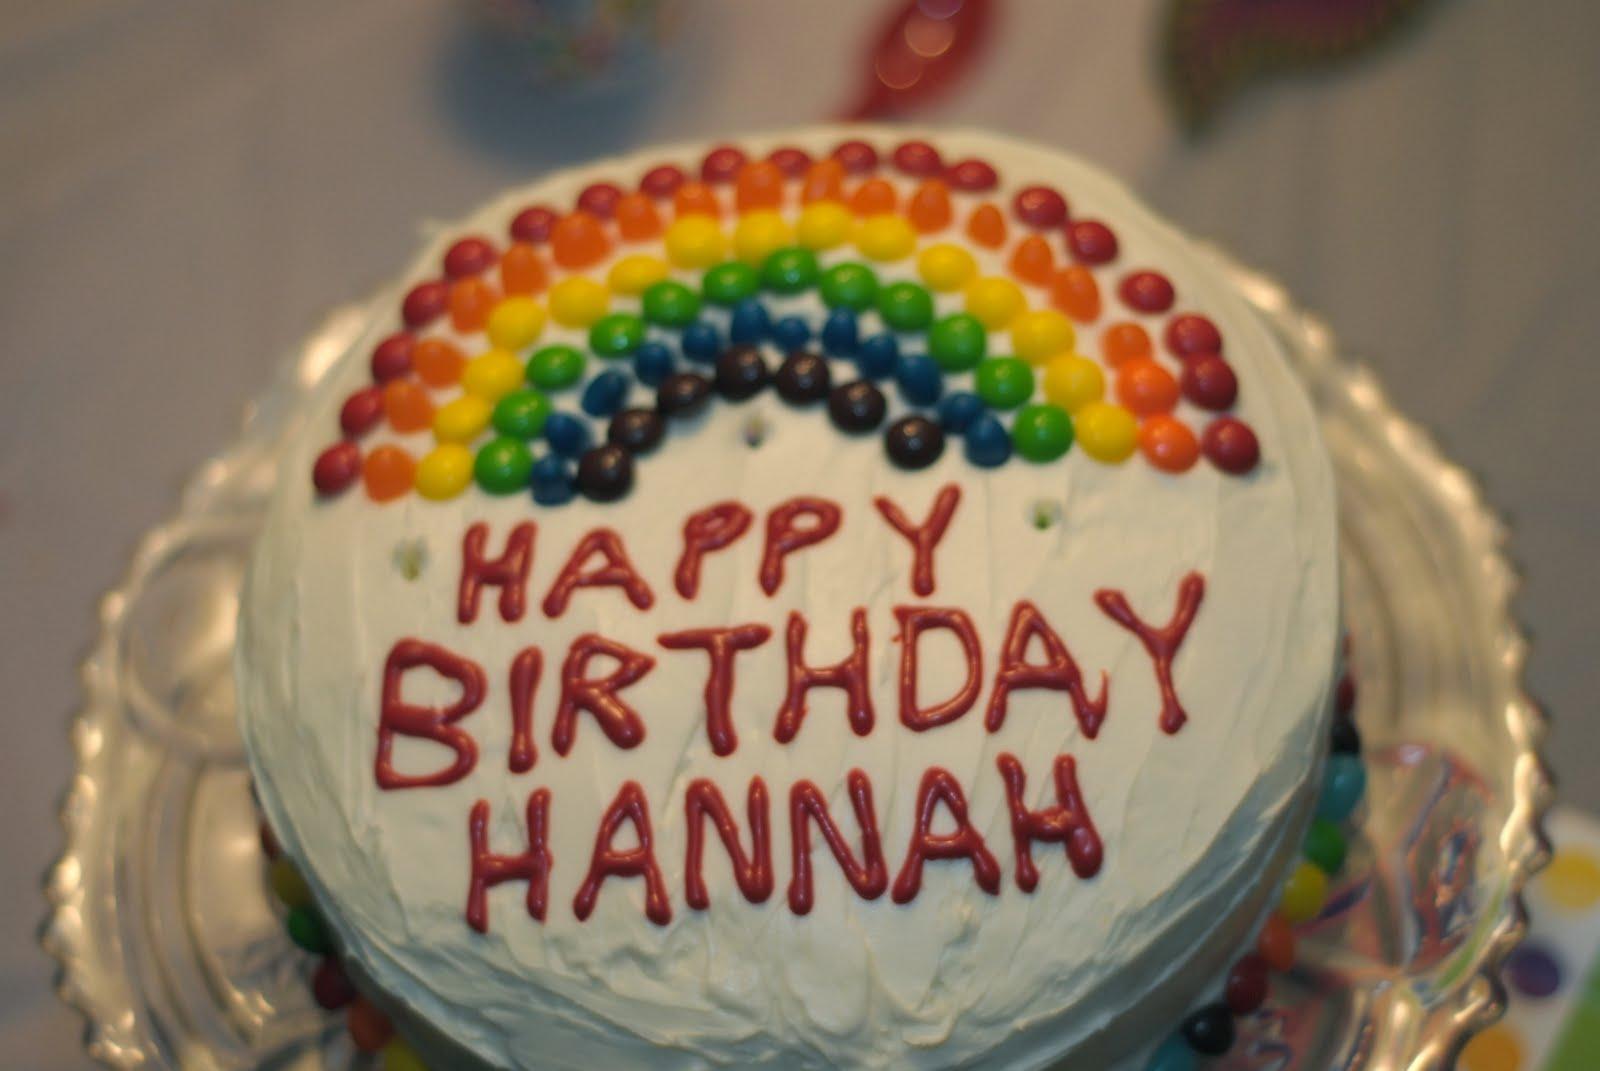 Hands Always Creating: Happy 5th Birthday, Hannah